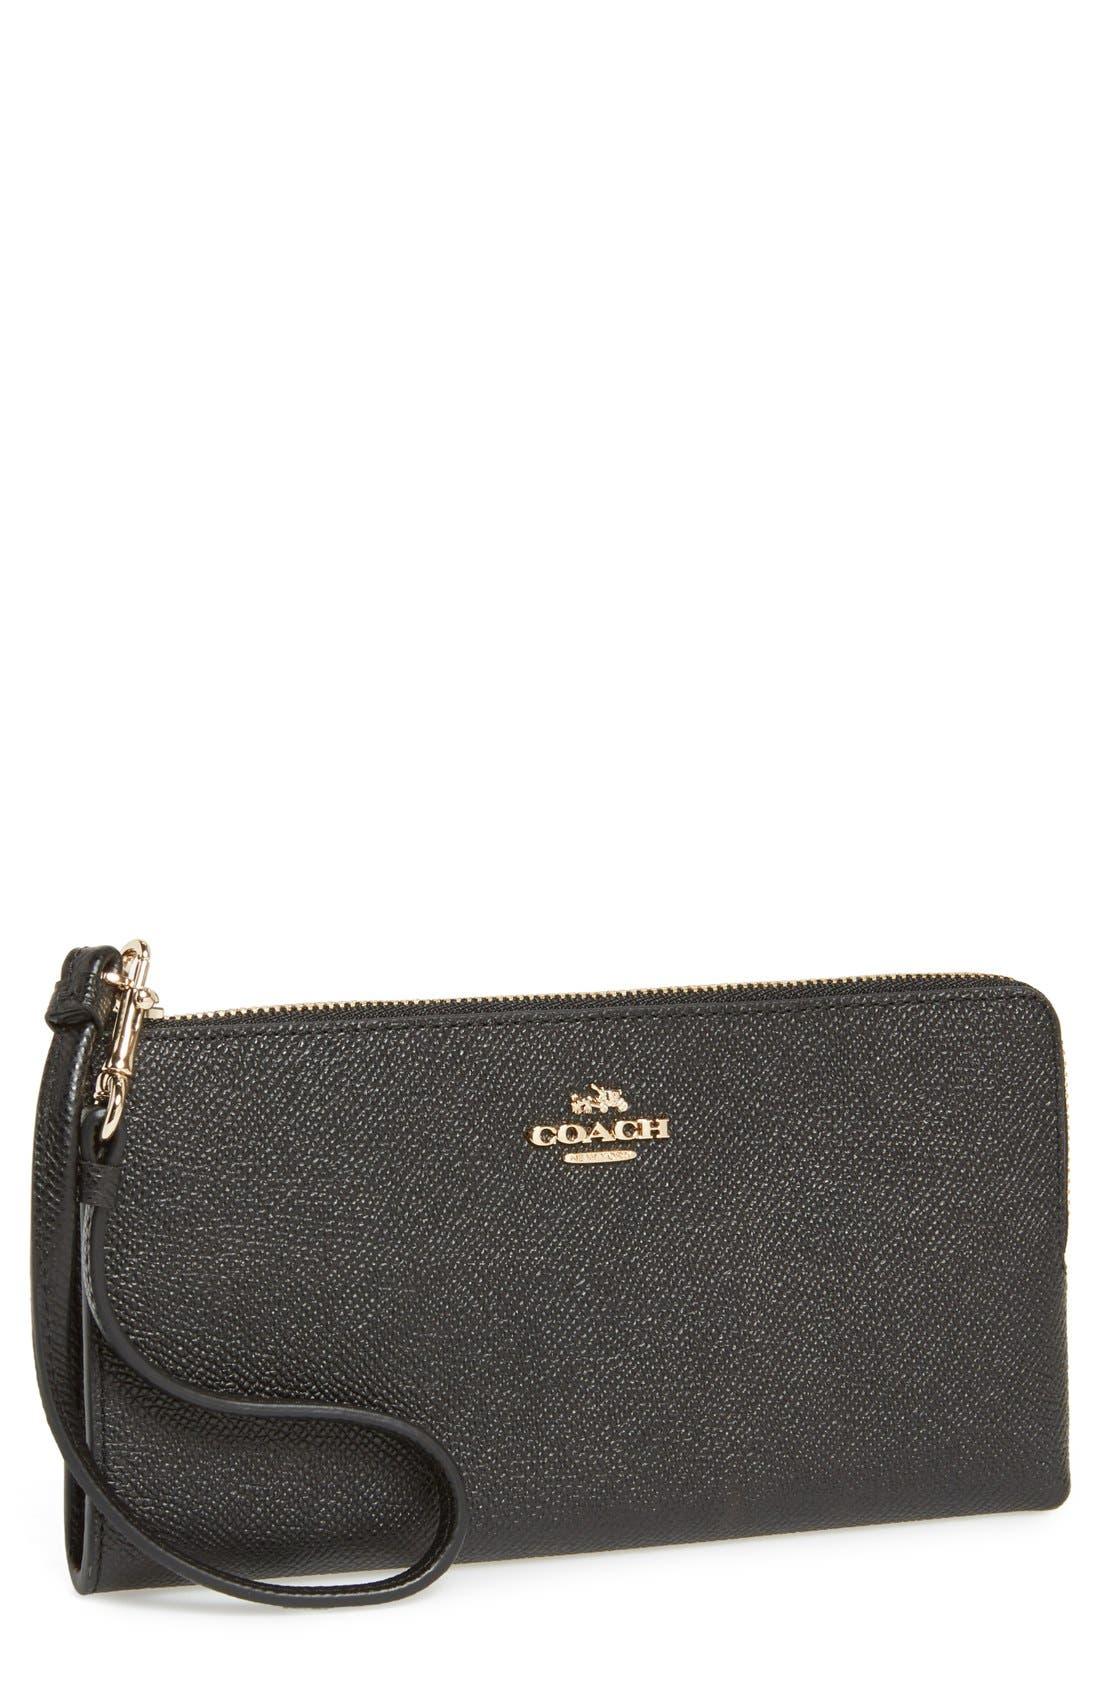 'Zippy' Leather Wallet,                             Main thumbnail 1, color,                             001